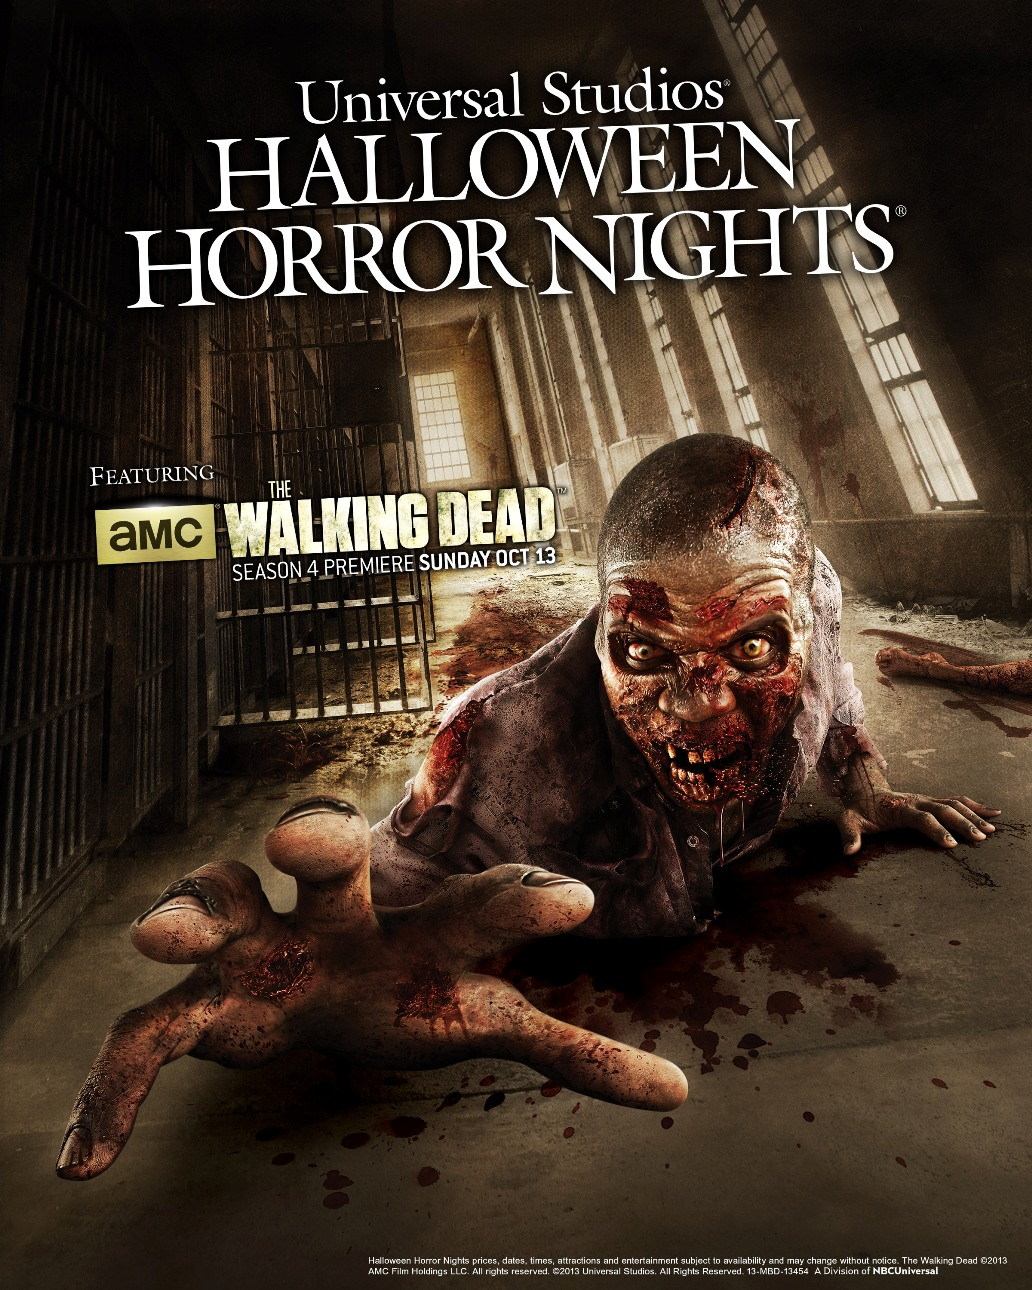 AMC's 'The Walking Dead' to Return to Halloween Horror Nights 23